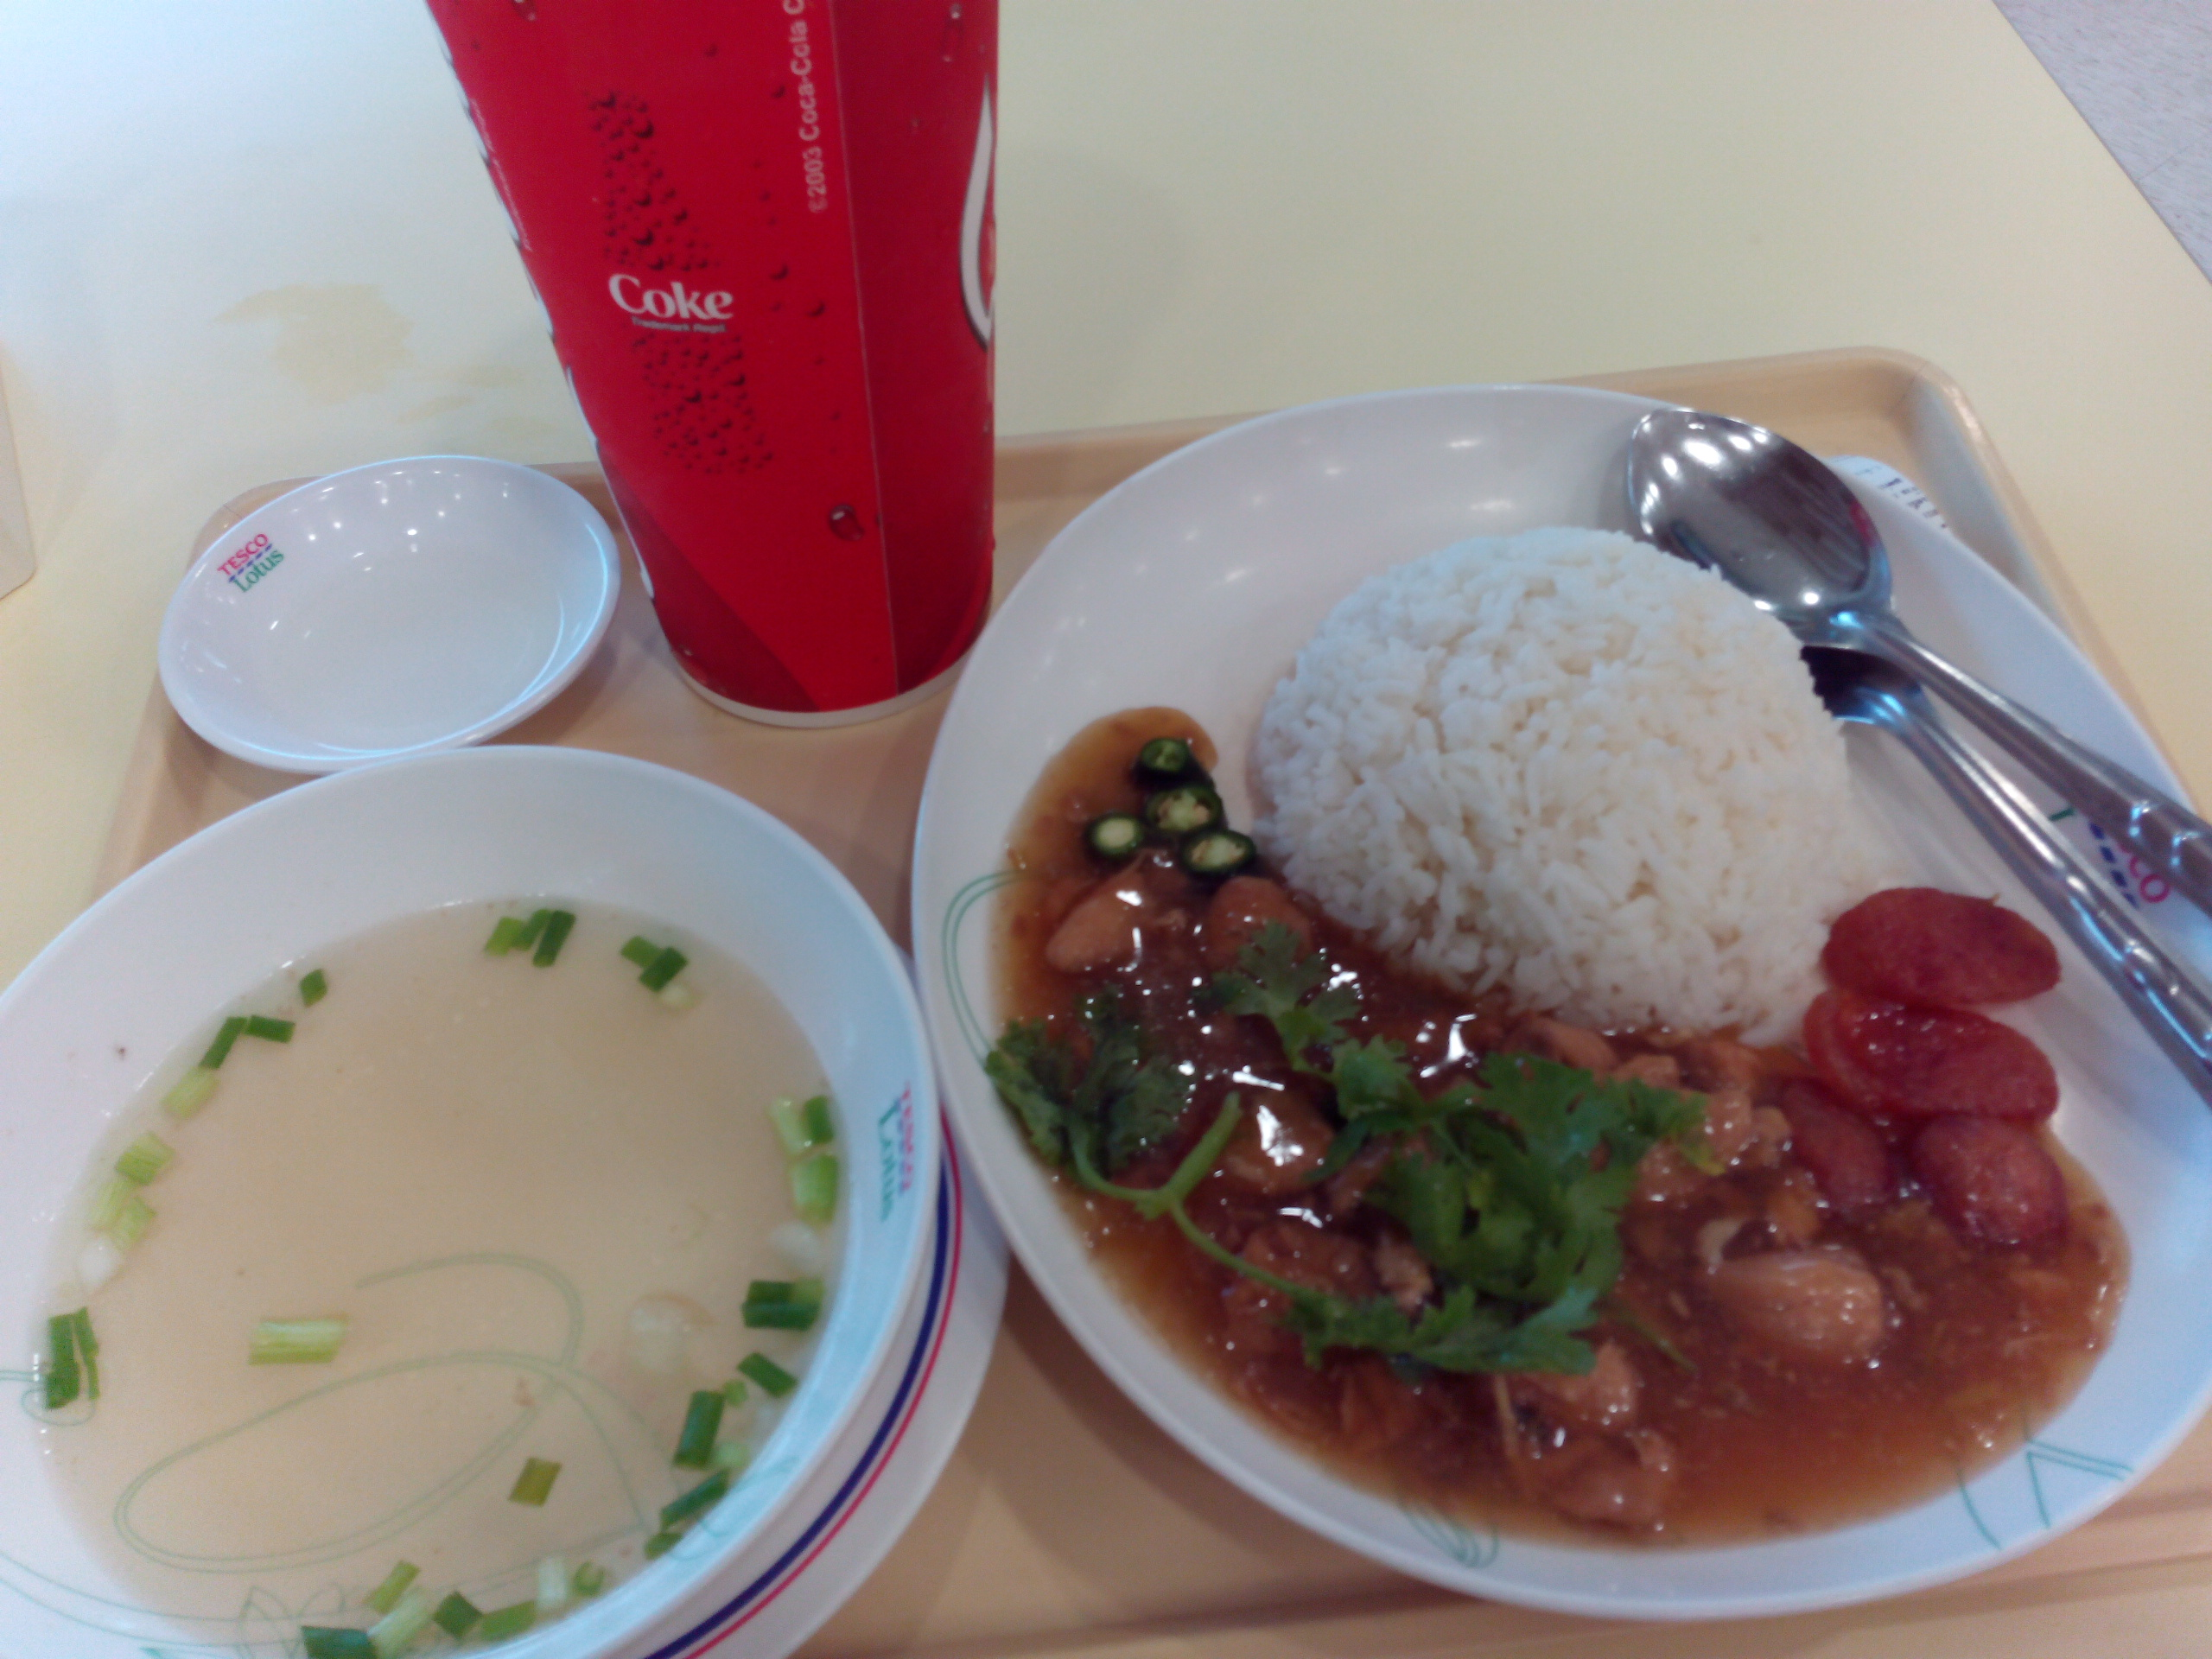 http://foodloader.net/finate_2014-06-04_Rice_and_chicken.jpg